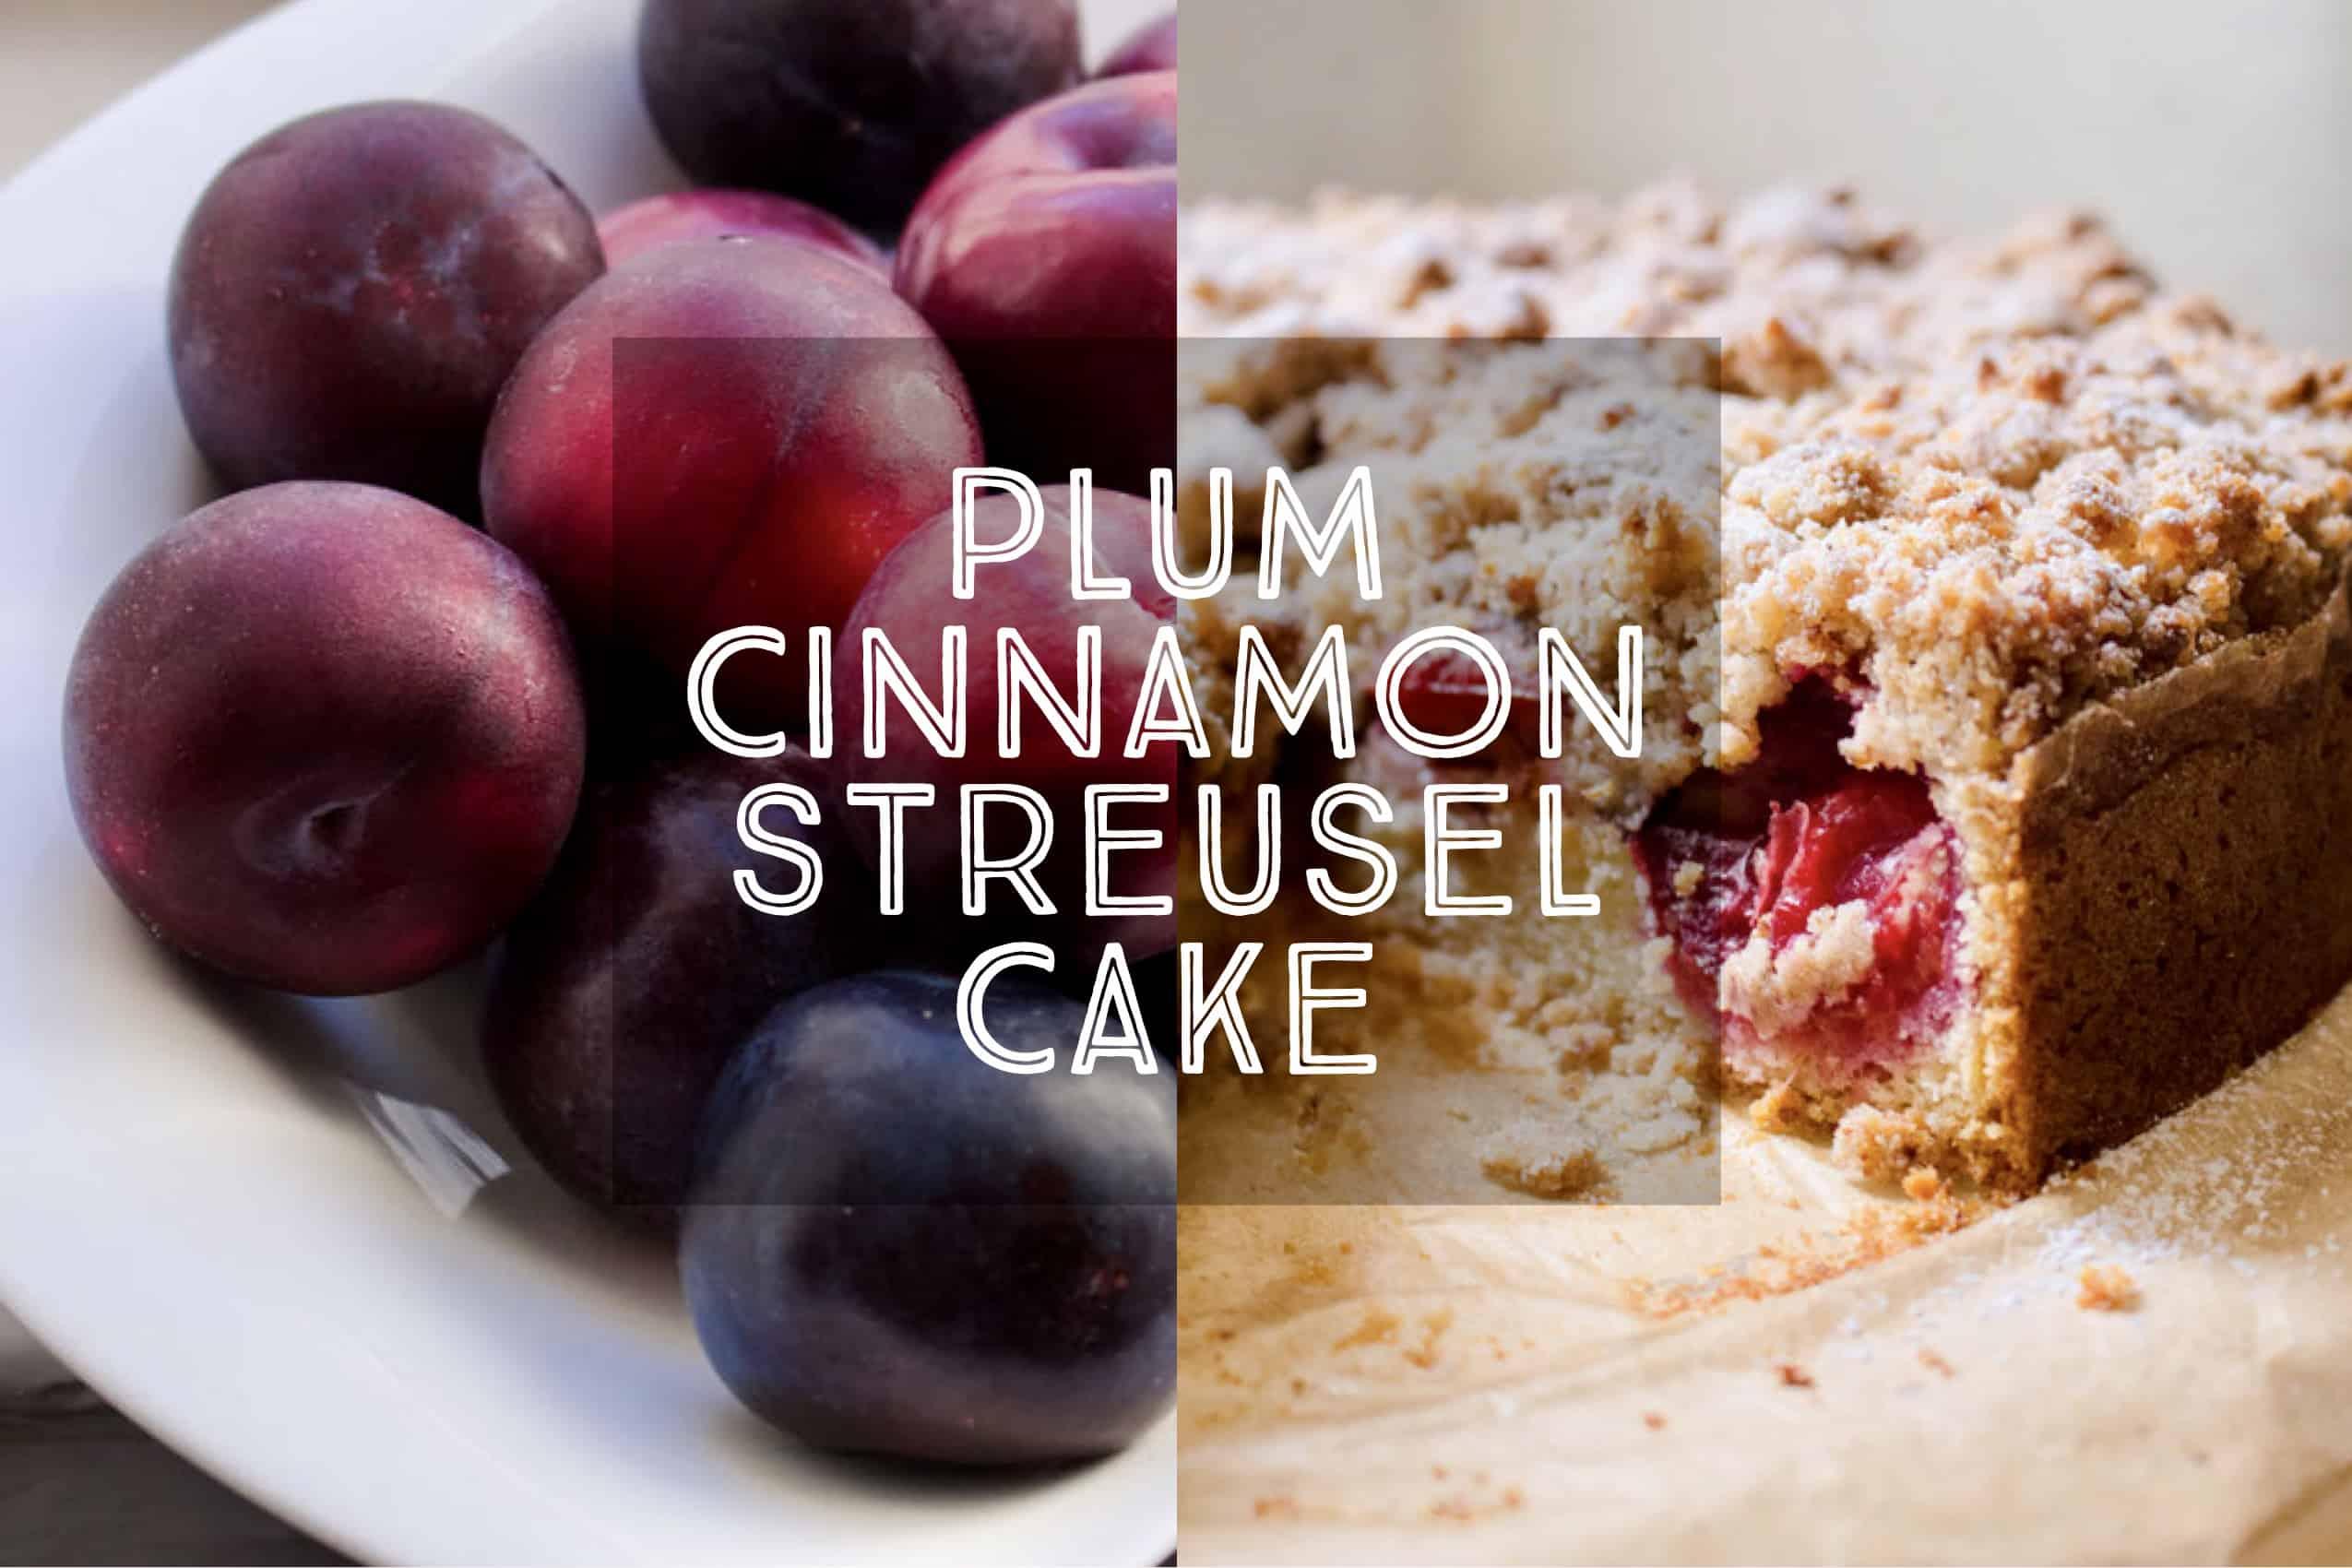 Plum Cinnamon Streusel Cake